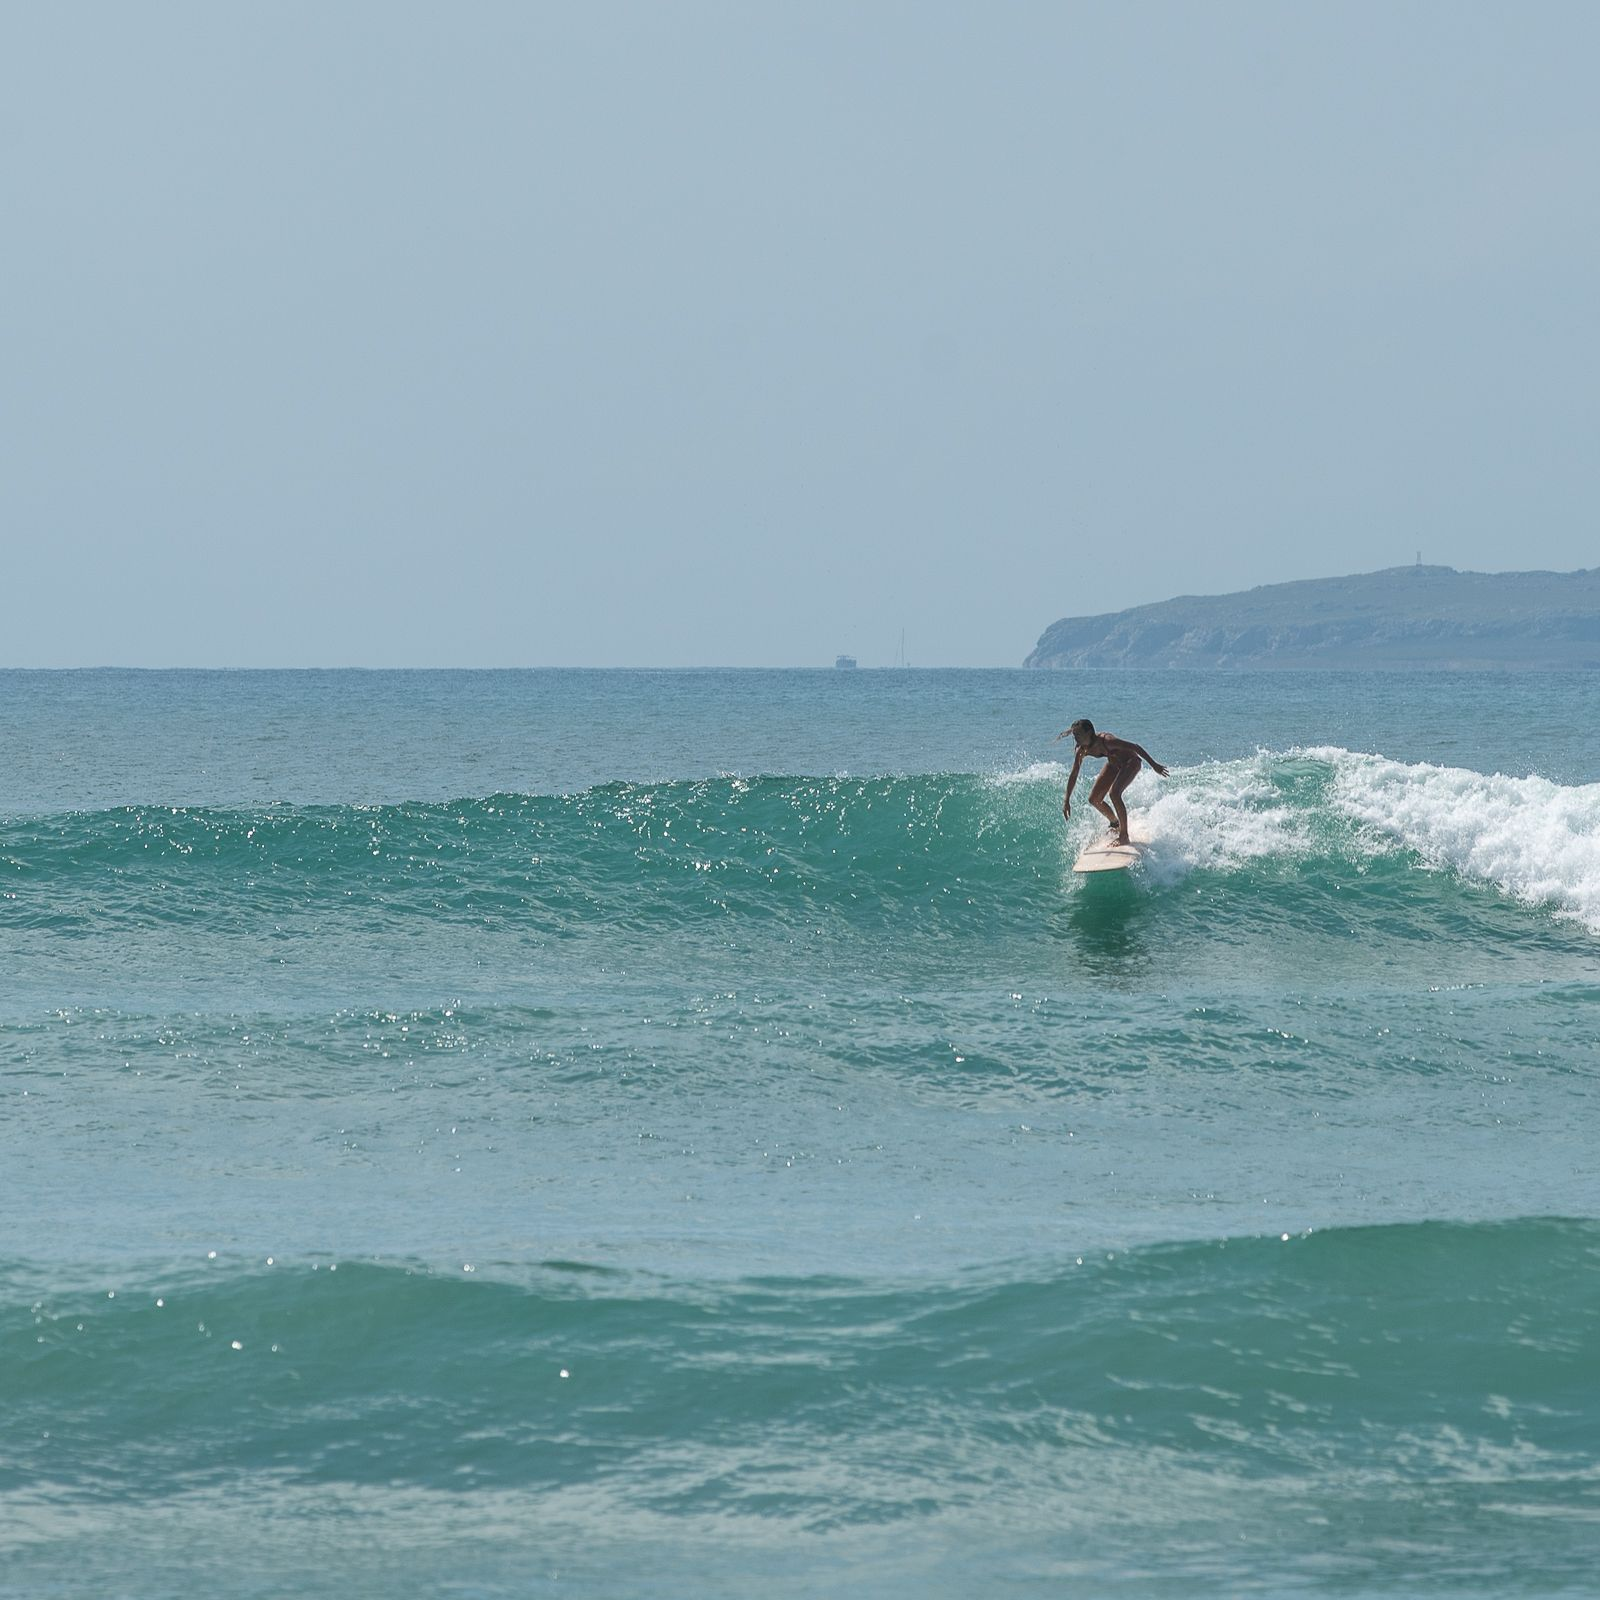 Surfing Punta Mita Our Surf Trip To Sayulita The Riviera Nayarit Surf Trip Surfing Trip